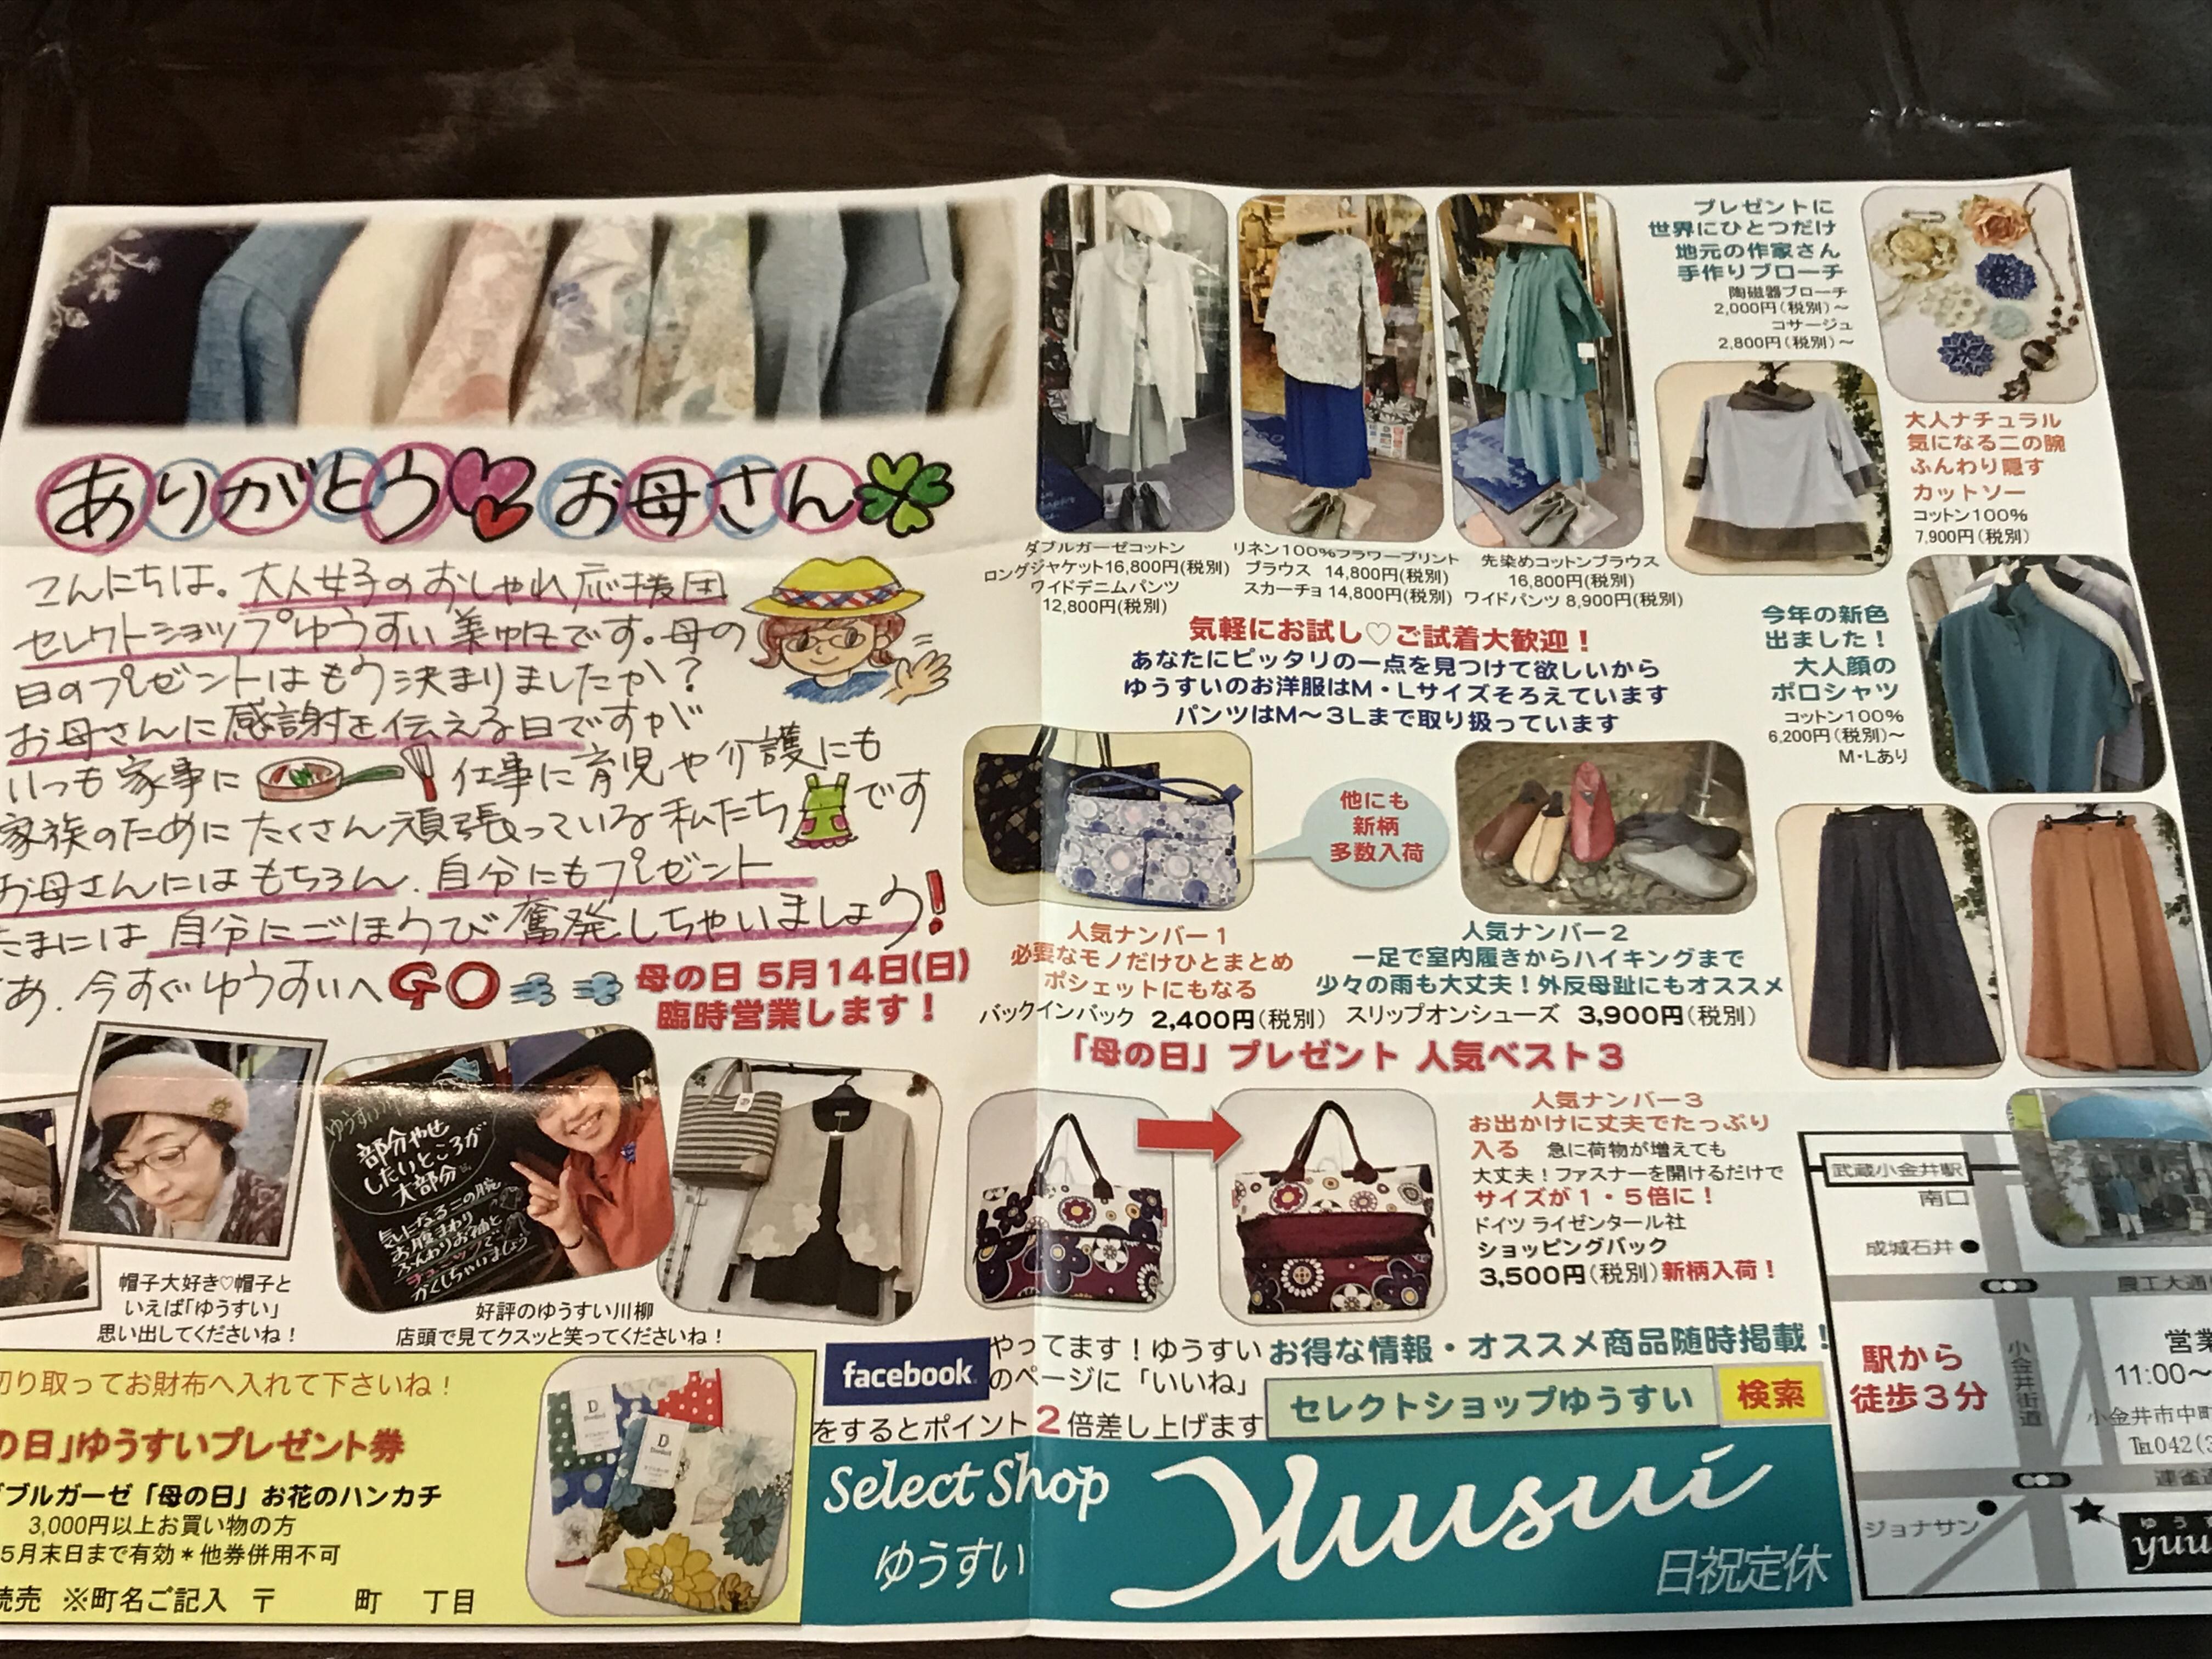 fc2blog_20170514224253520.jpg